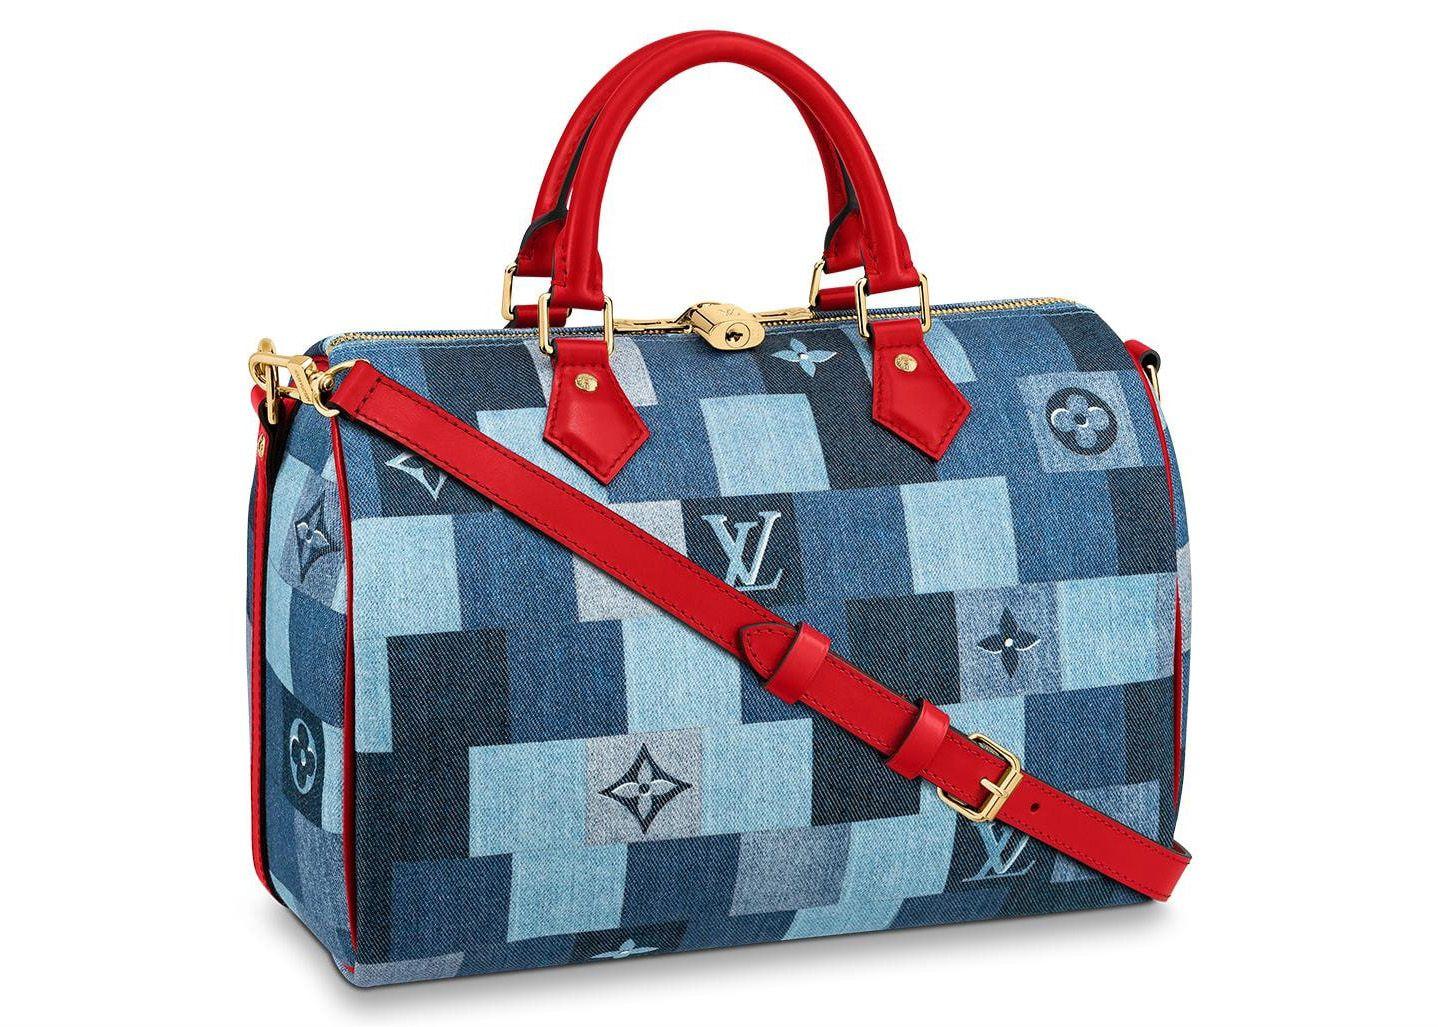 Pre Owned Louis Vuitton Speedy Bandouliere 30 Denim Monogram Check Blue Red Modesens In 2020 Louis Vuitton Speedy Bandouliere Louis Vuitton Handbags Speedy Louis Vuitton